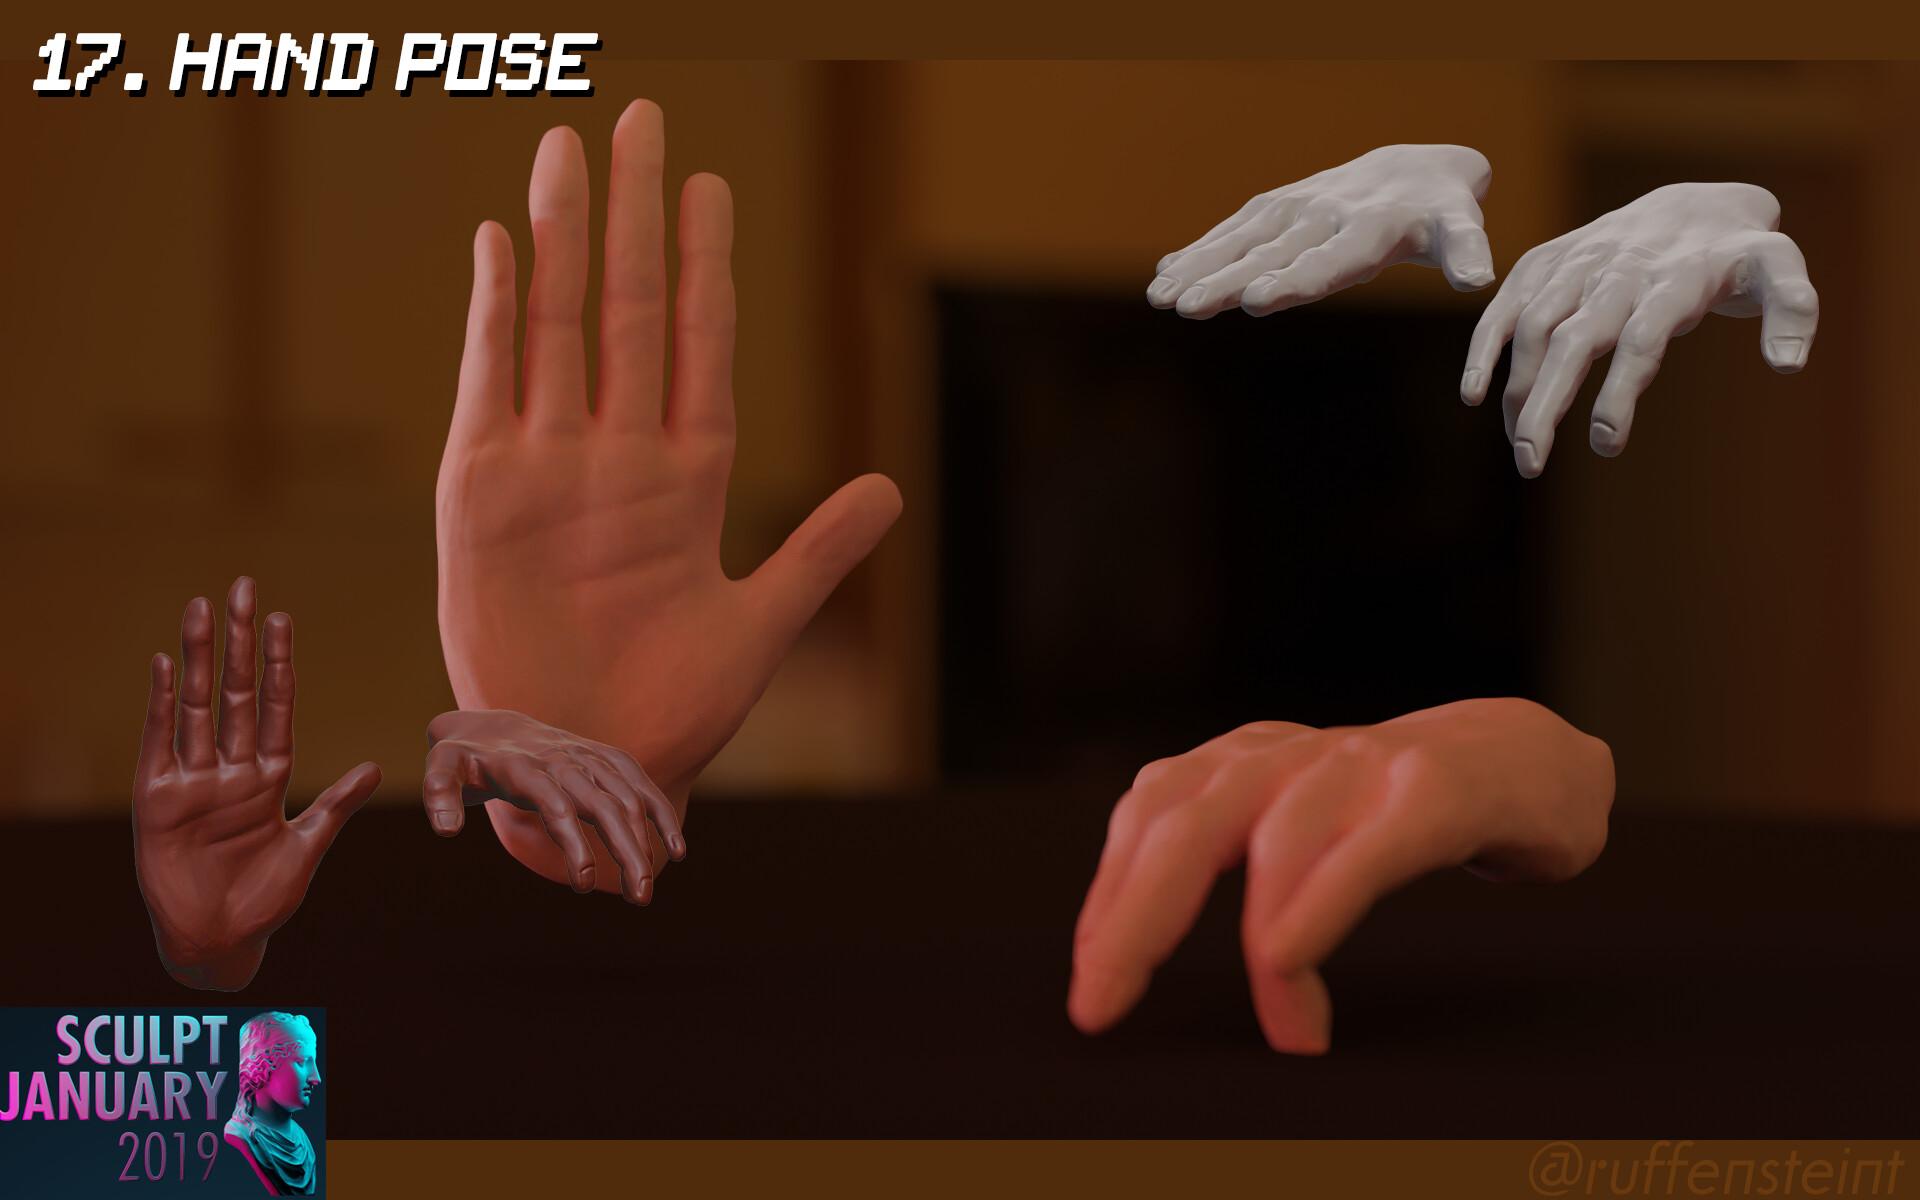 Kris hyde 17 hand pose